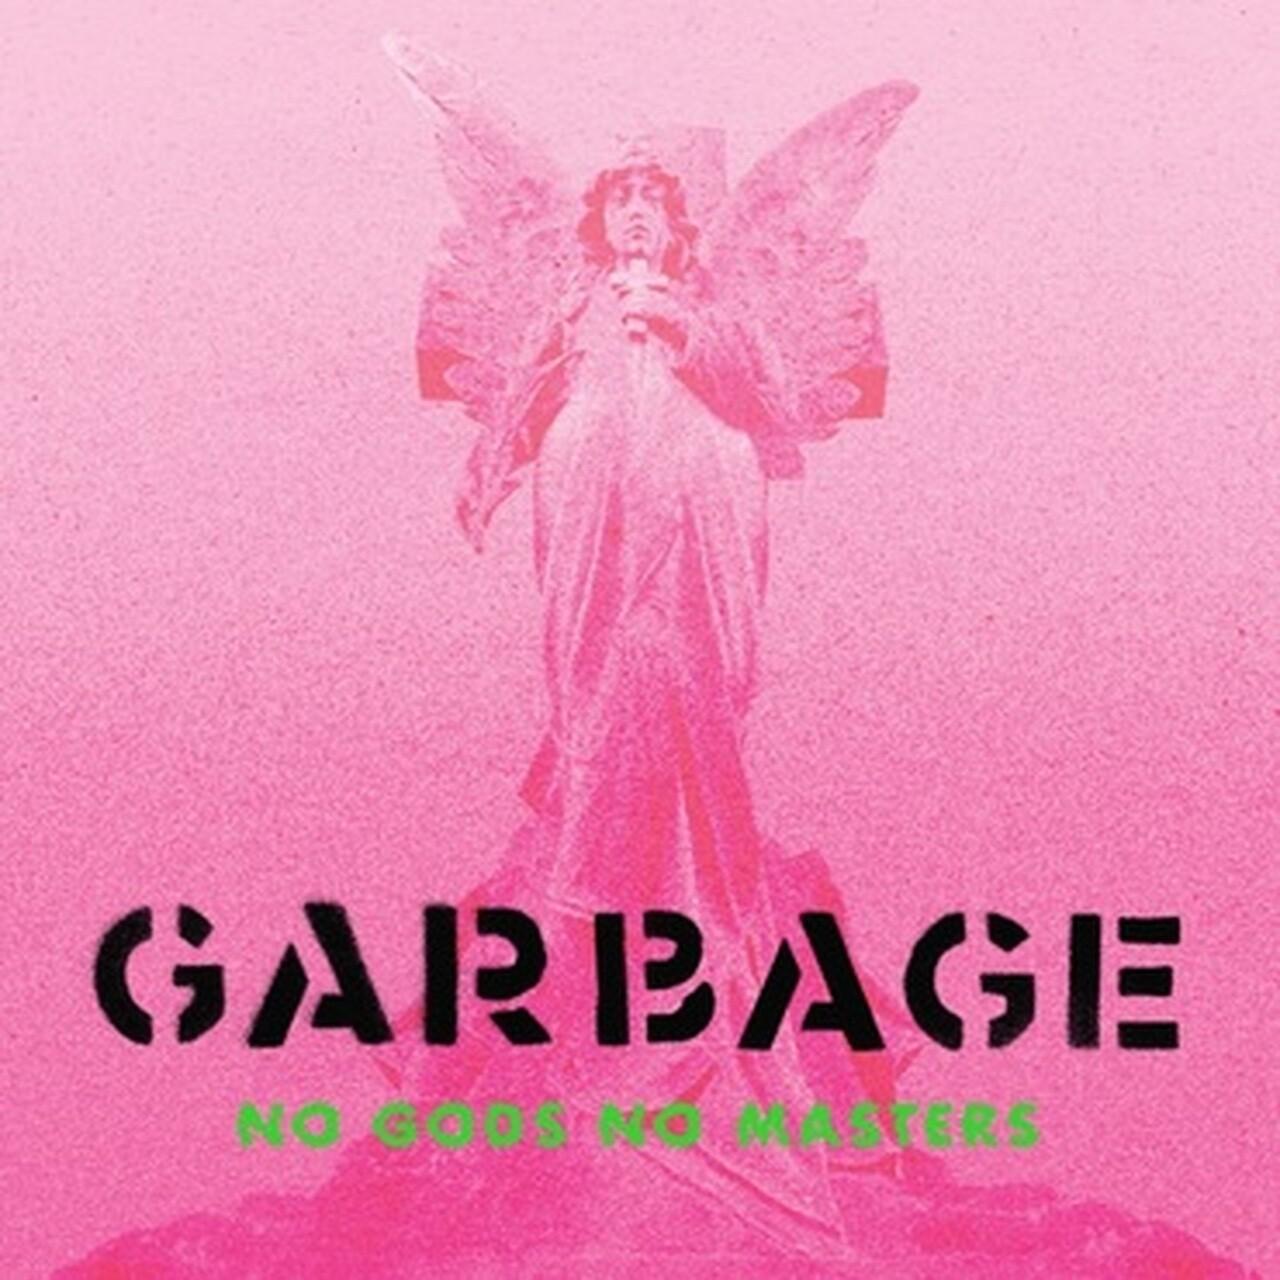 Garbage / No Gods No Master